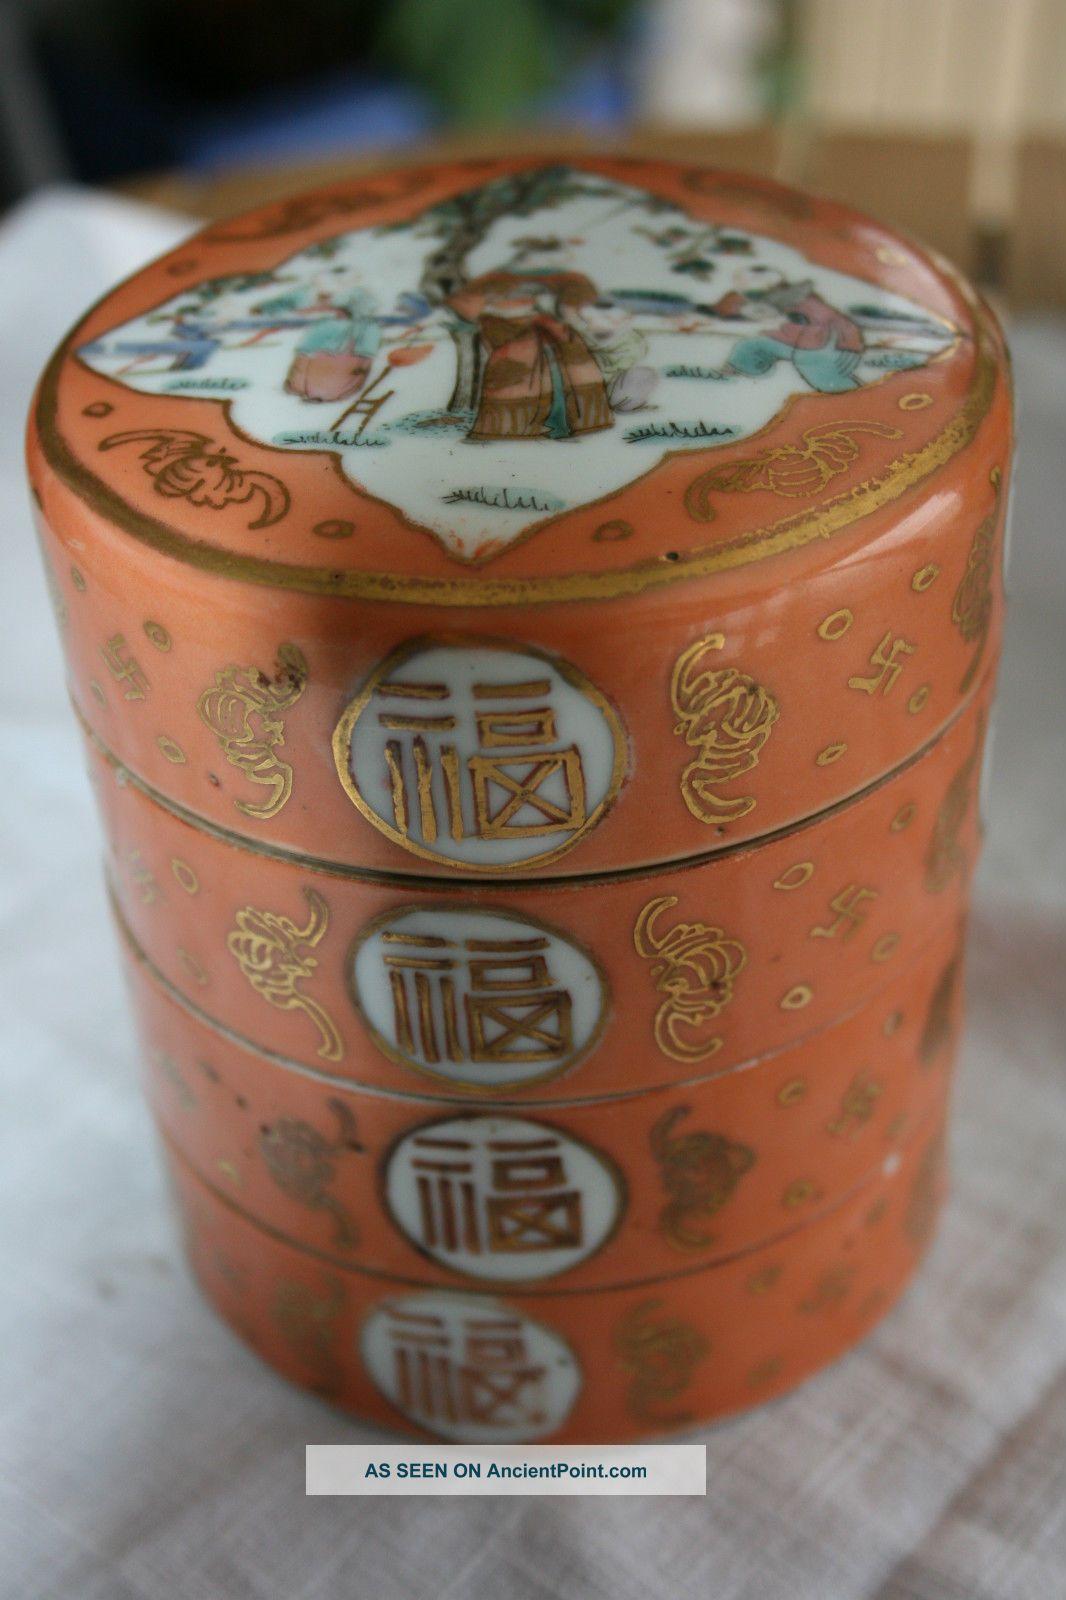 Antique Tongzhi Guangxhu Period Chinese Stacking Boxes C 1875 Boxes photo